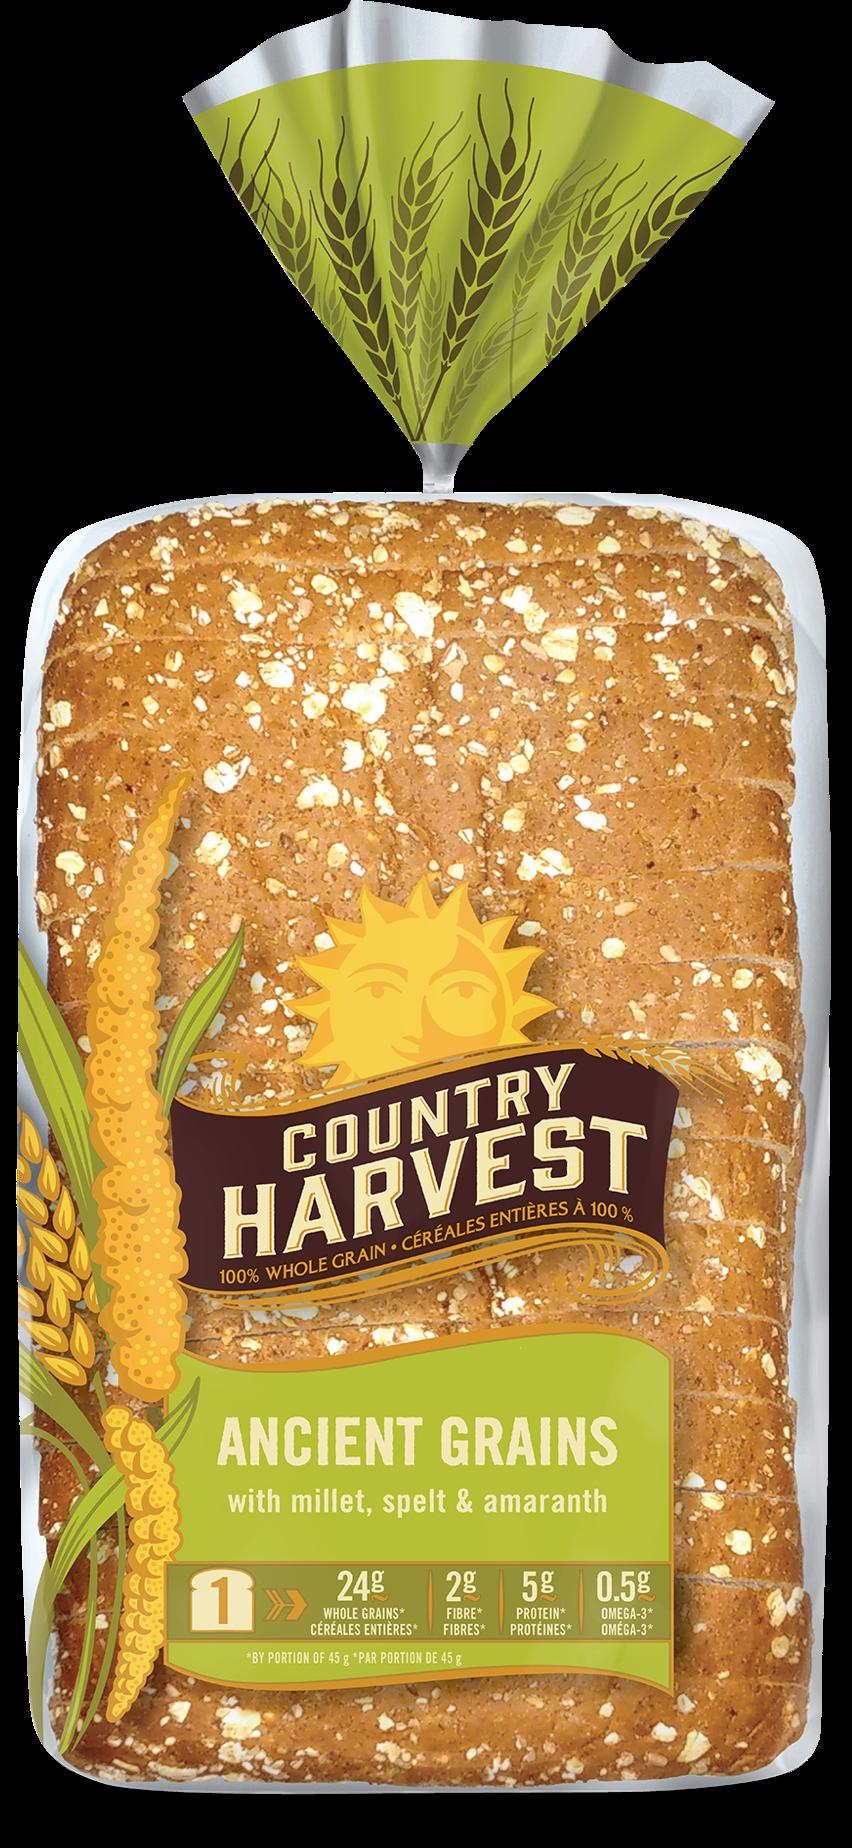 Ancient grains country harvest. Wheat clipart grain bag